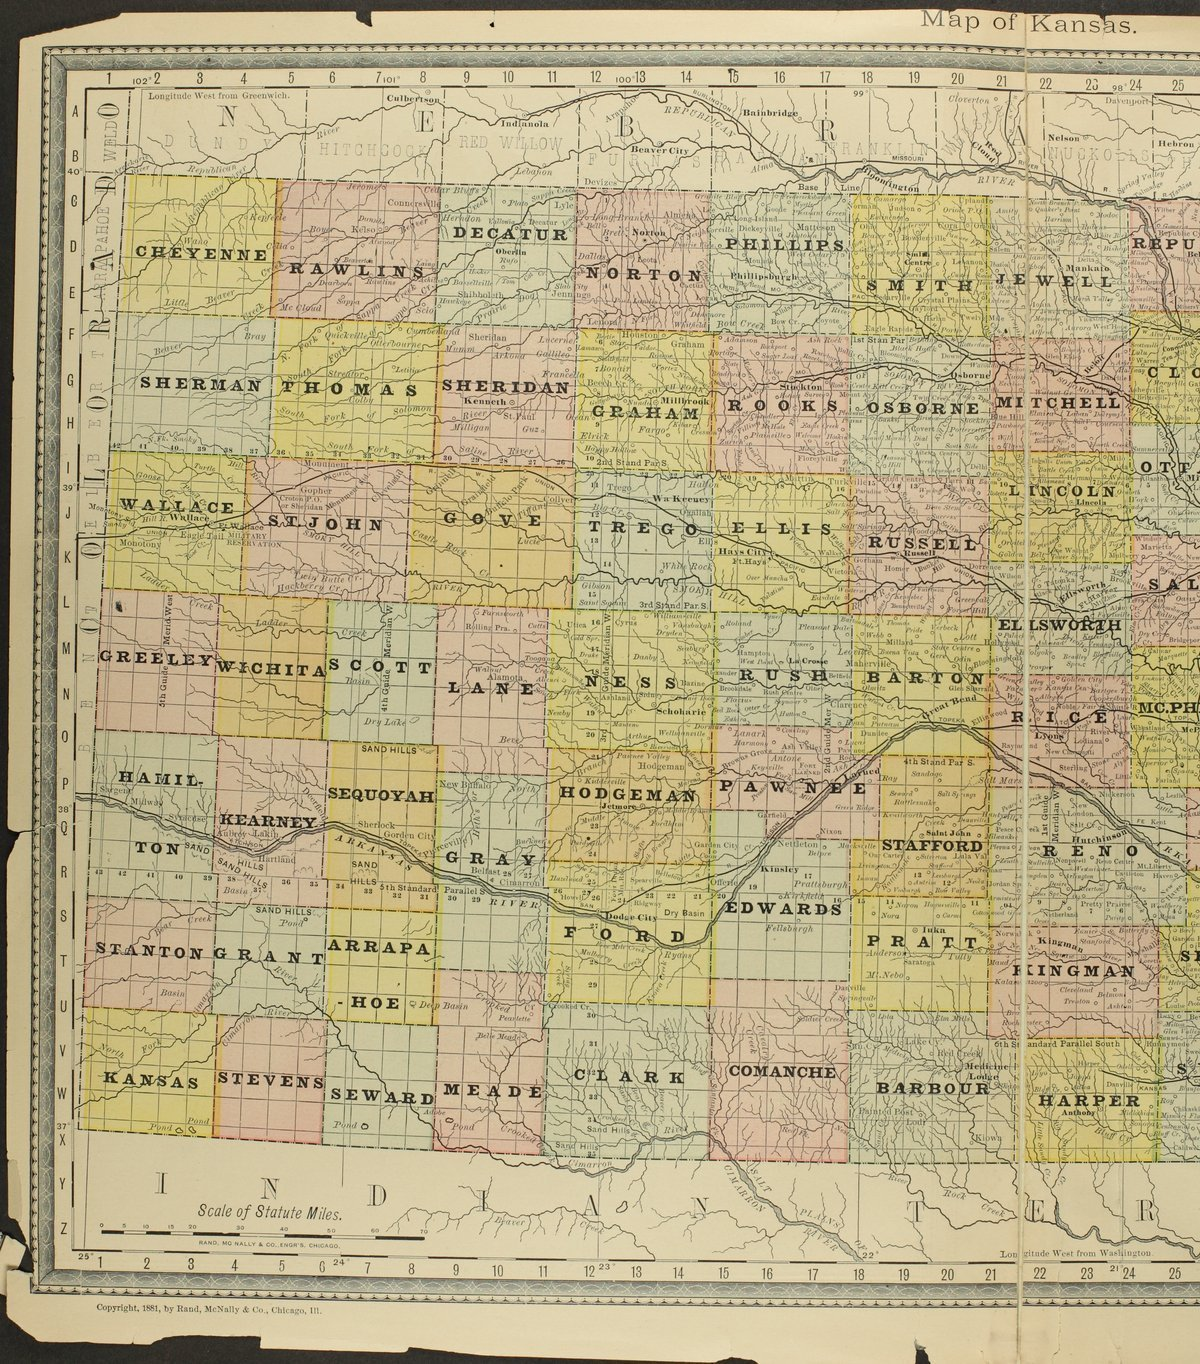 Historical plat book of Doniphan County, Kansas - Map of Kansas